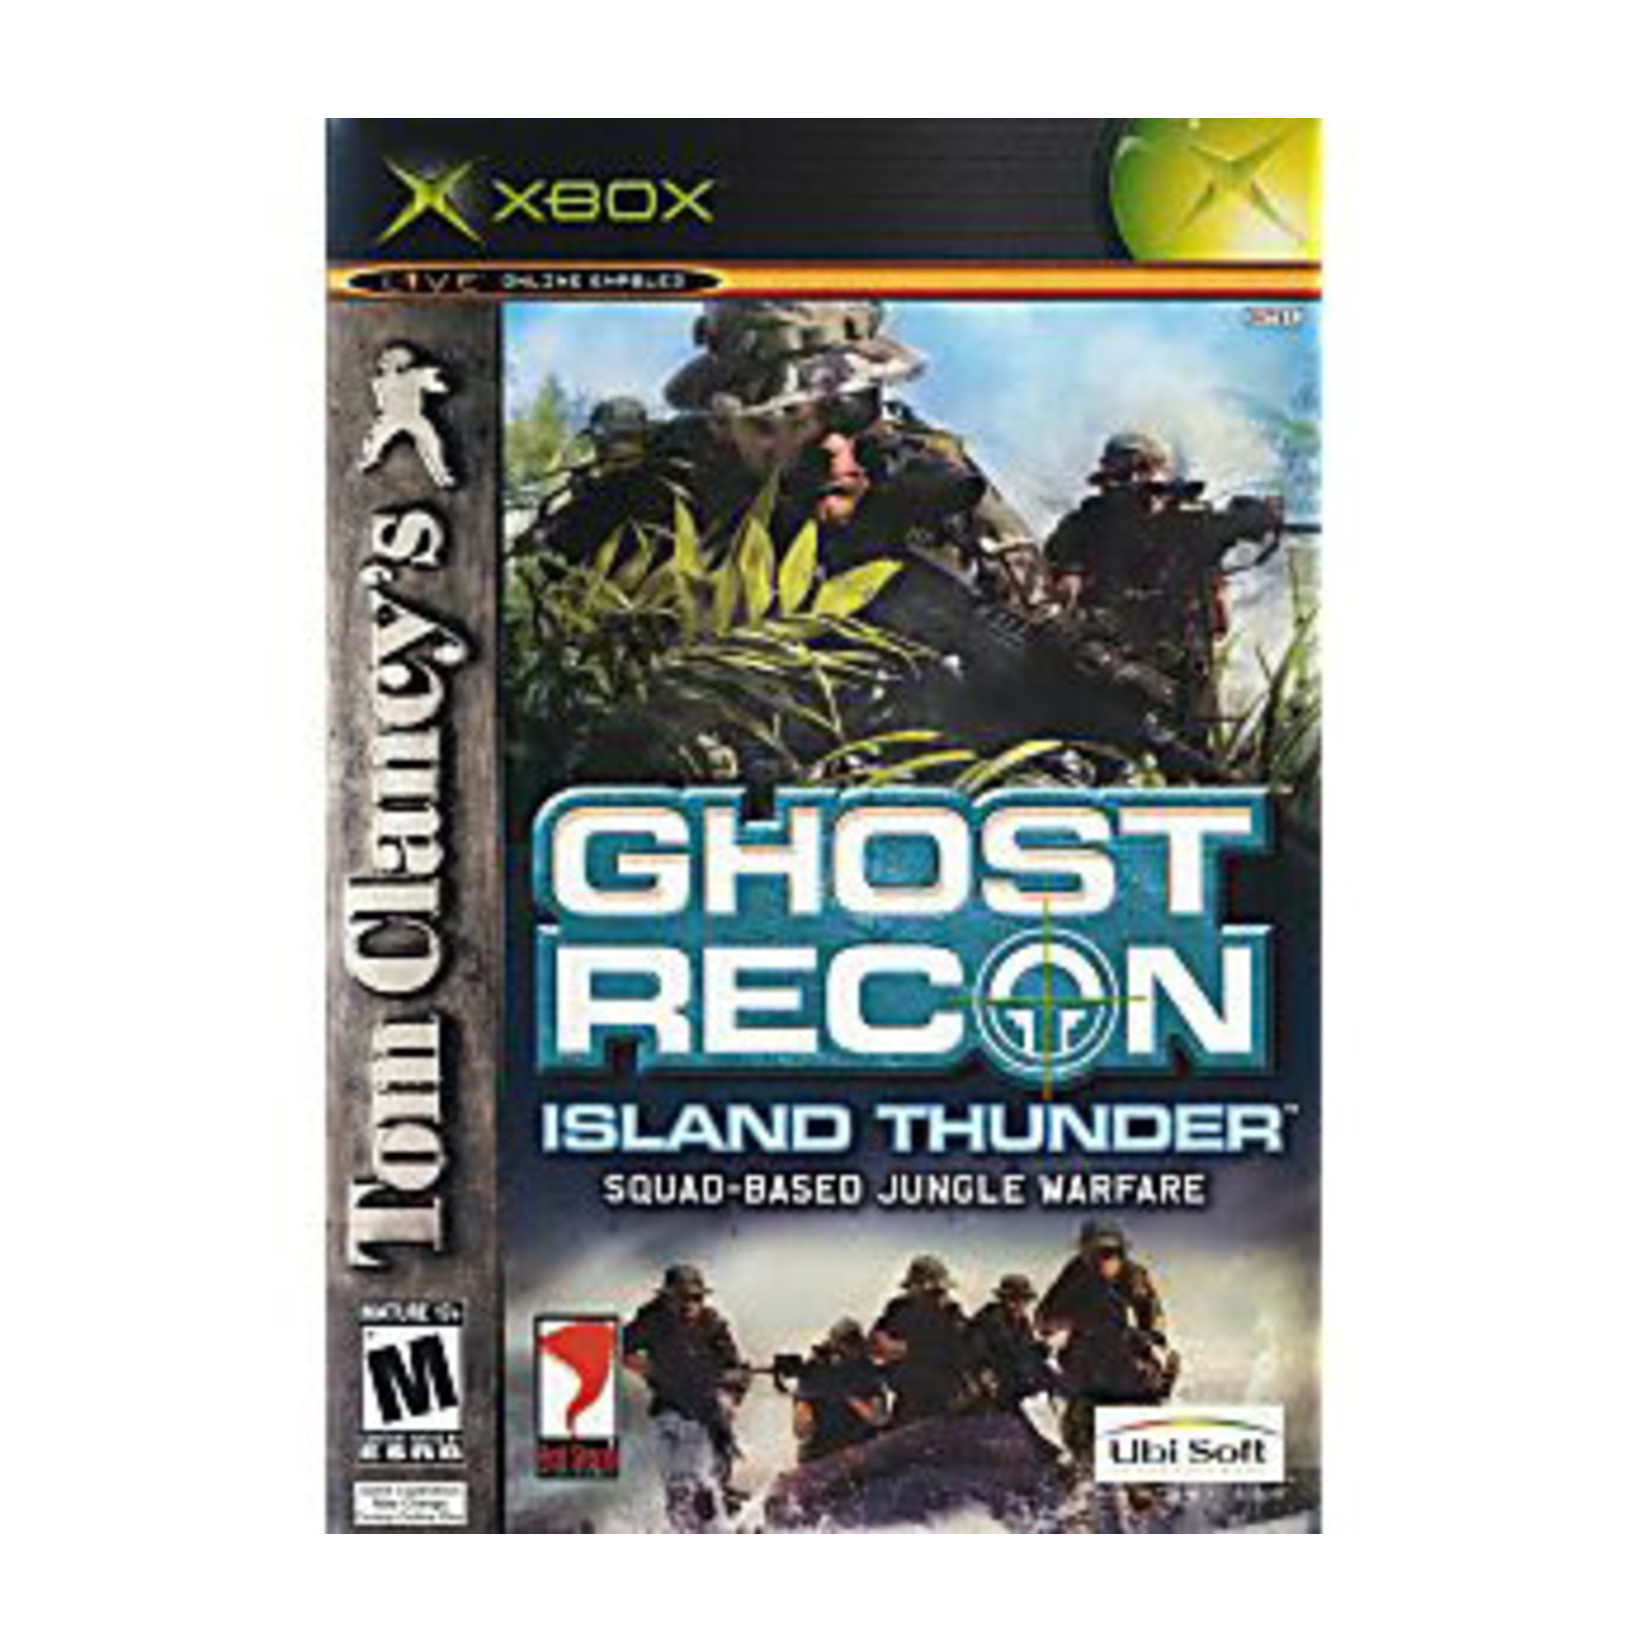 XBU-GHOST RECON ISLAND THUNDER